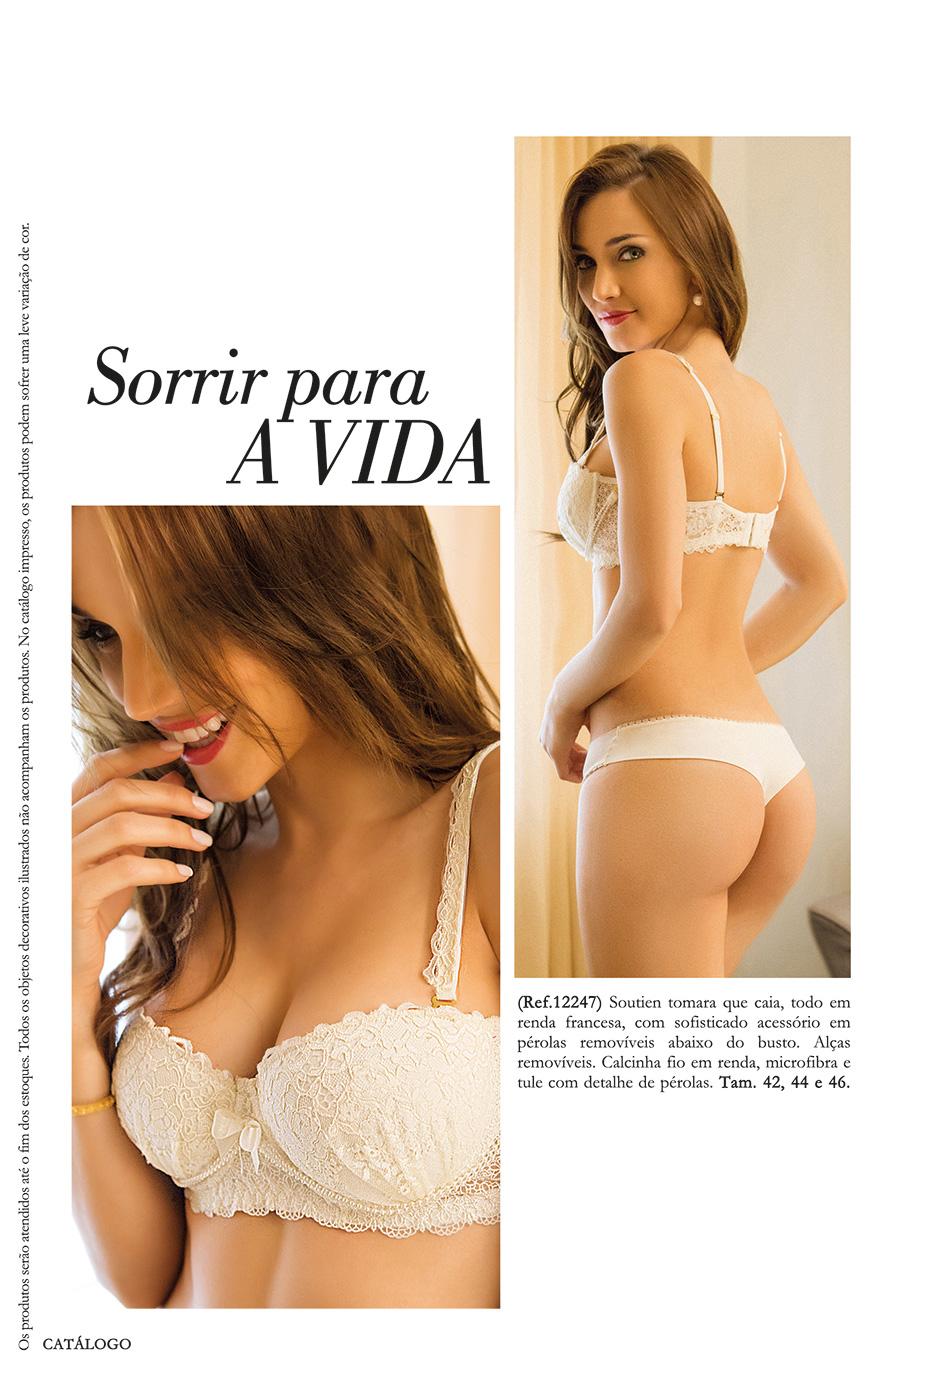 aadb86c721 Catálogo 41